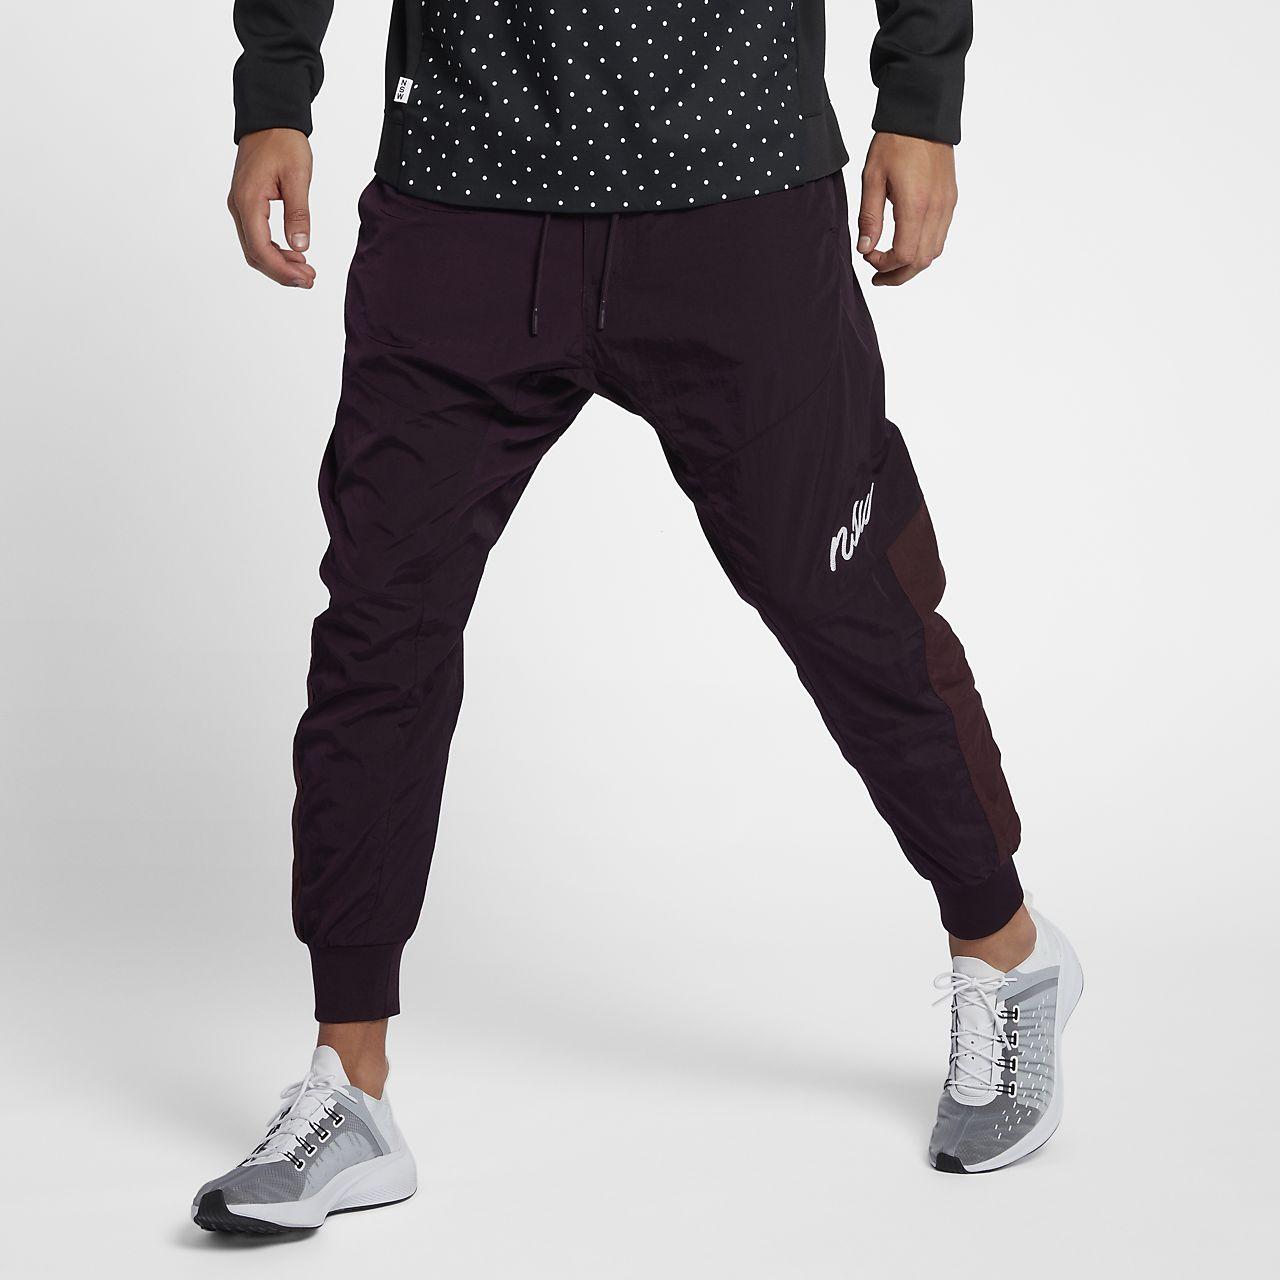 c4dbd1864e43 Nike Sportswear NSW Men s Woven Joggers. Nike.com AU